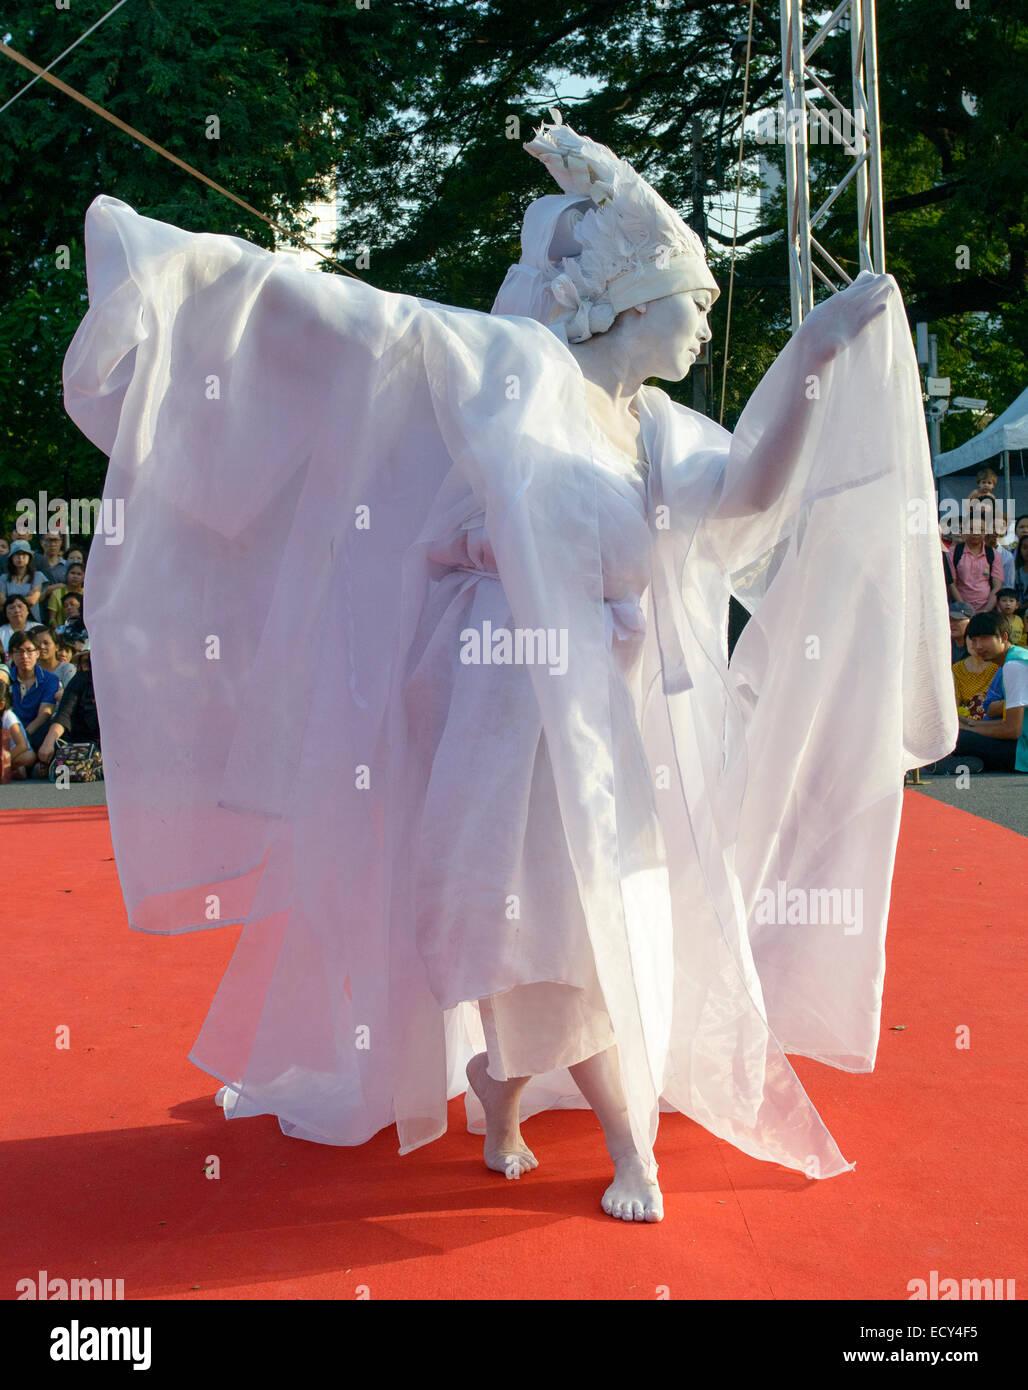 Avant garde butoh artist performing at the Street Show, Bangkok, Thailand - Stock Image